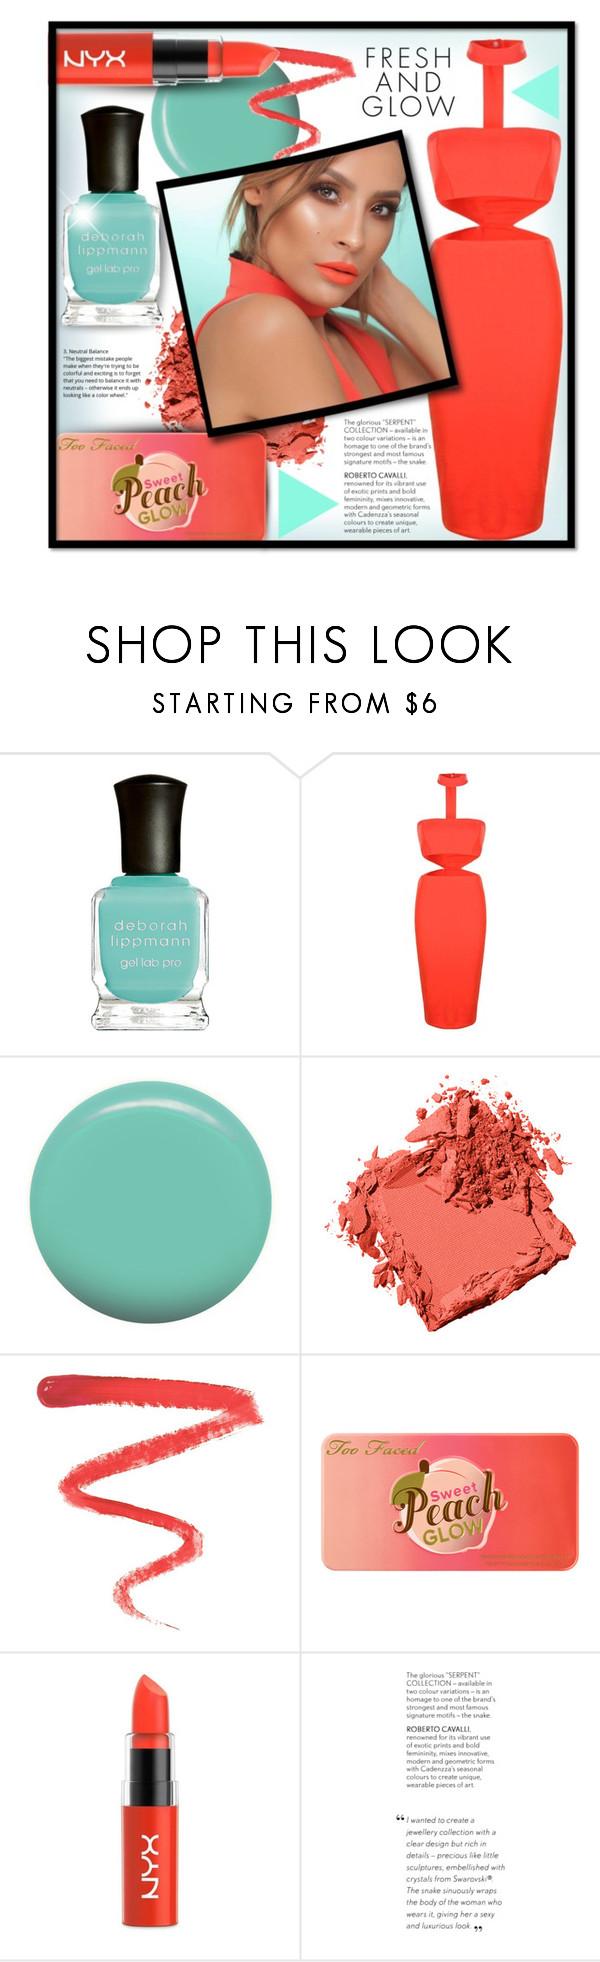 """#741 - Minty Fresh & Choker Dress"" by lilmissmegan ❤ liked on Polyvore featuring beauty, Deborah Lippmann, Boohoo, Jin Soon, Bobbi Brown Cosmetics, Ellis Faas, Too Faced Cosmetics, NYX, Beauty and mint"